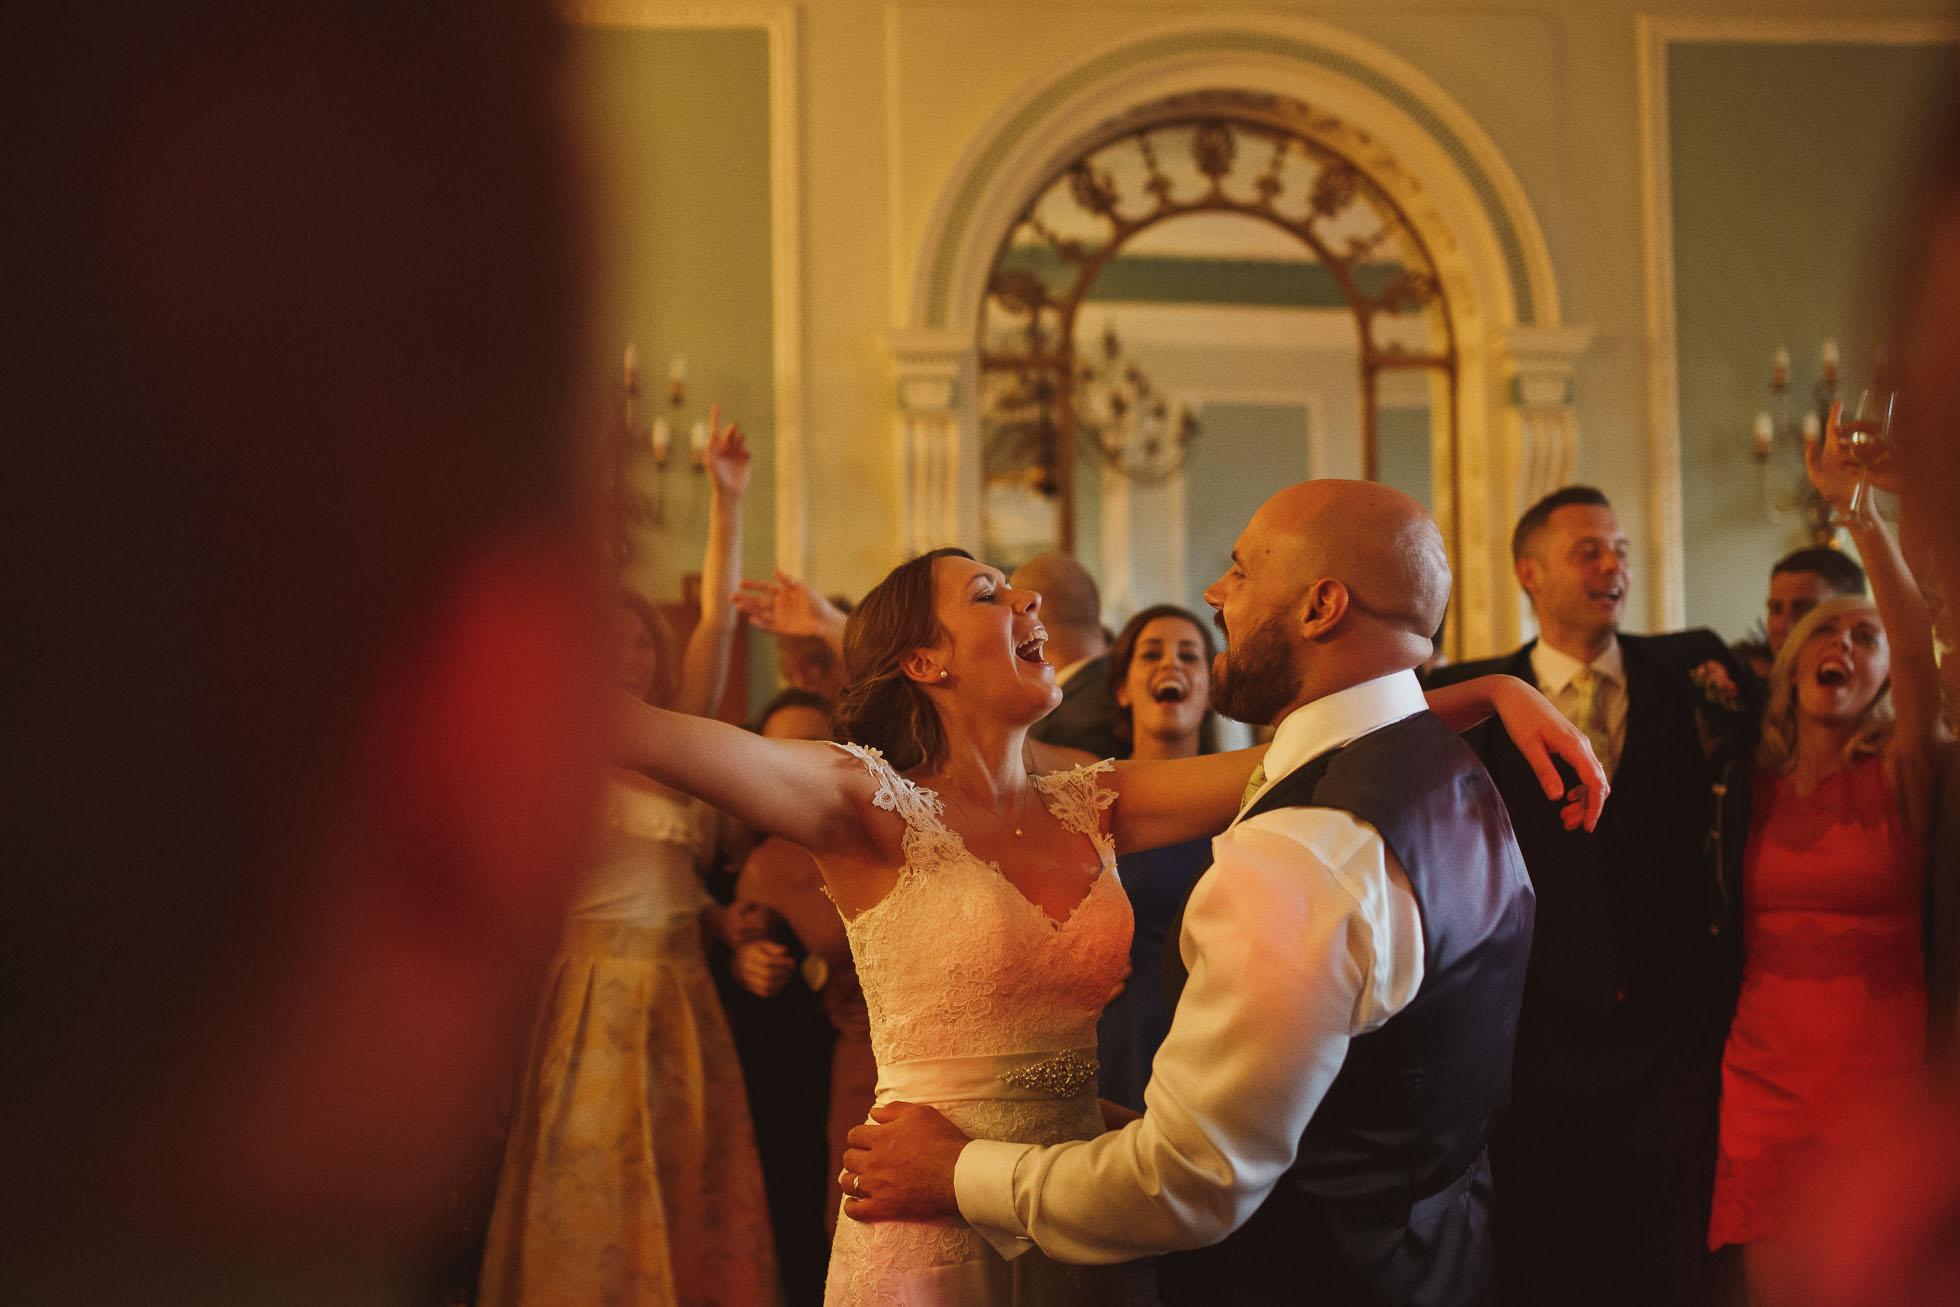 denton-hall-wedding-photographer-68.jpg